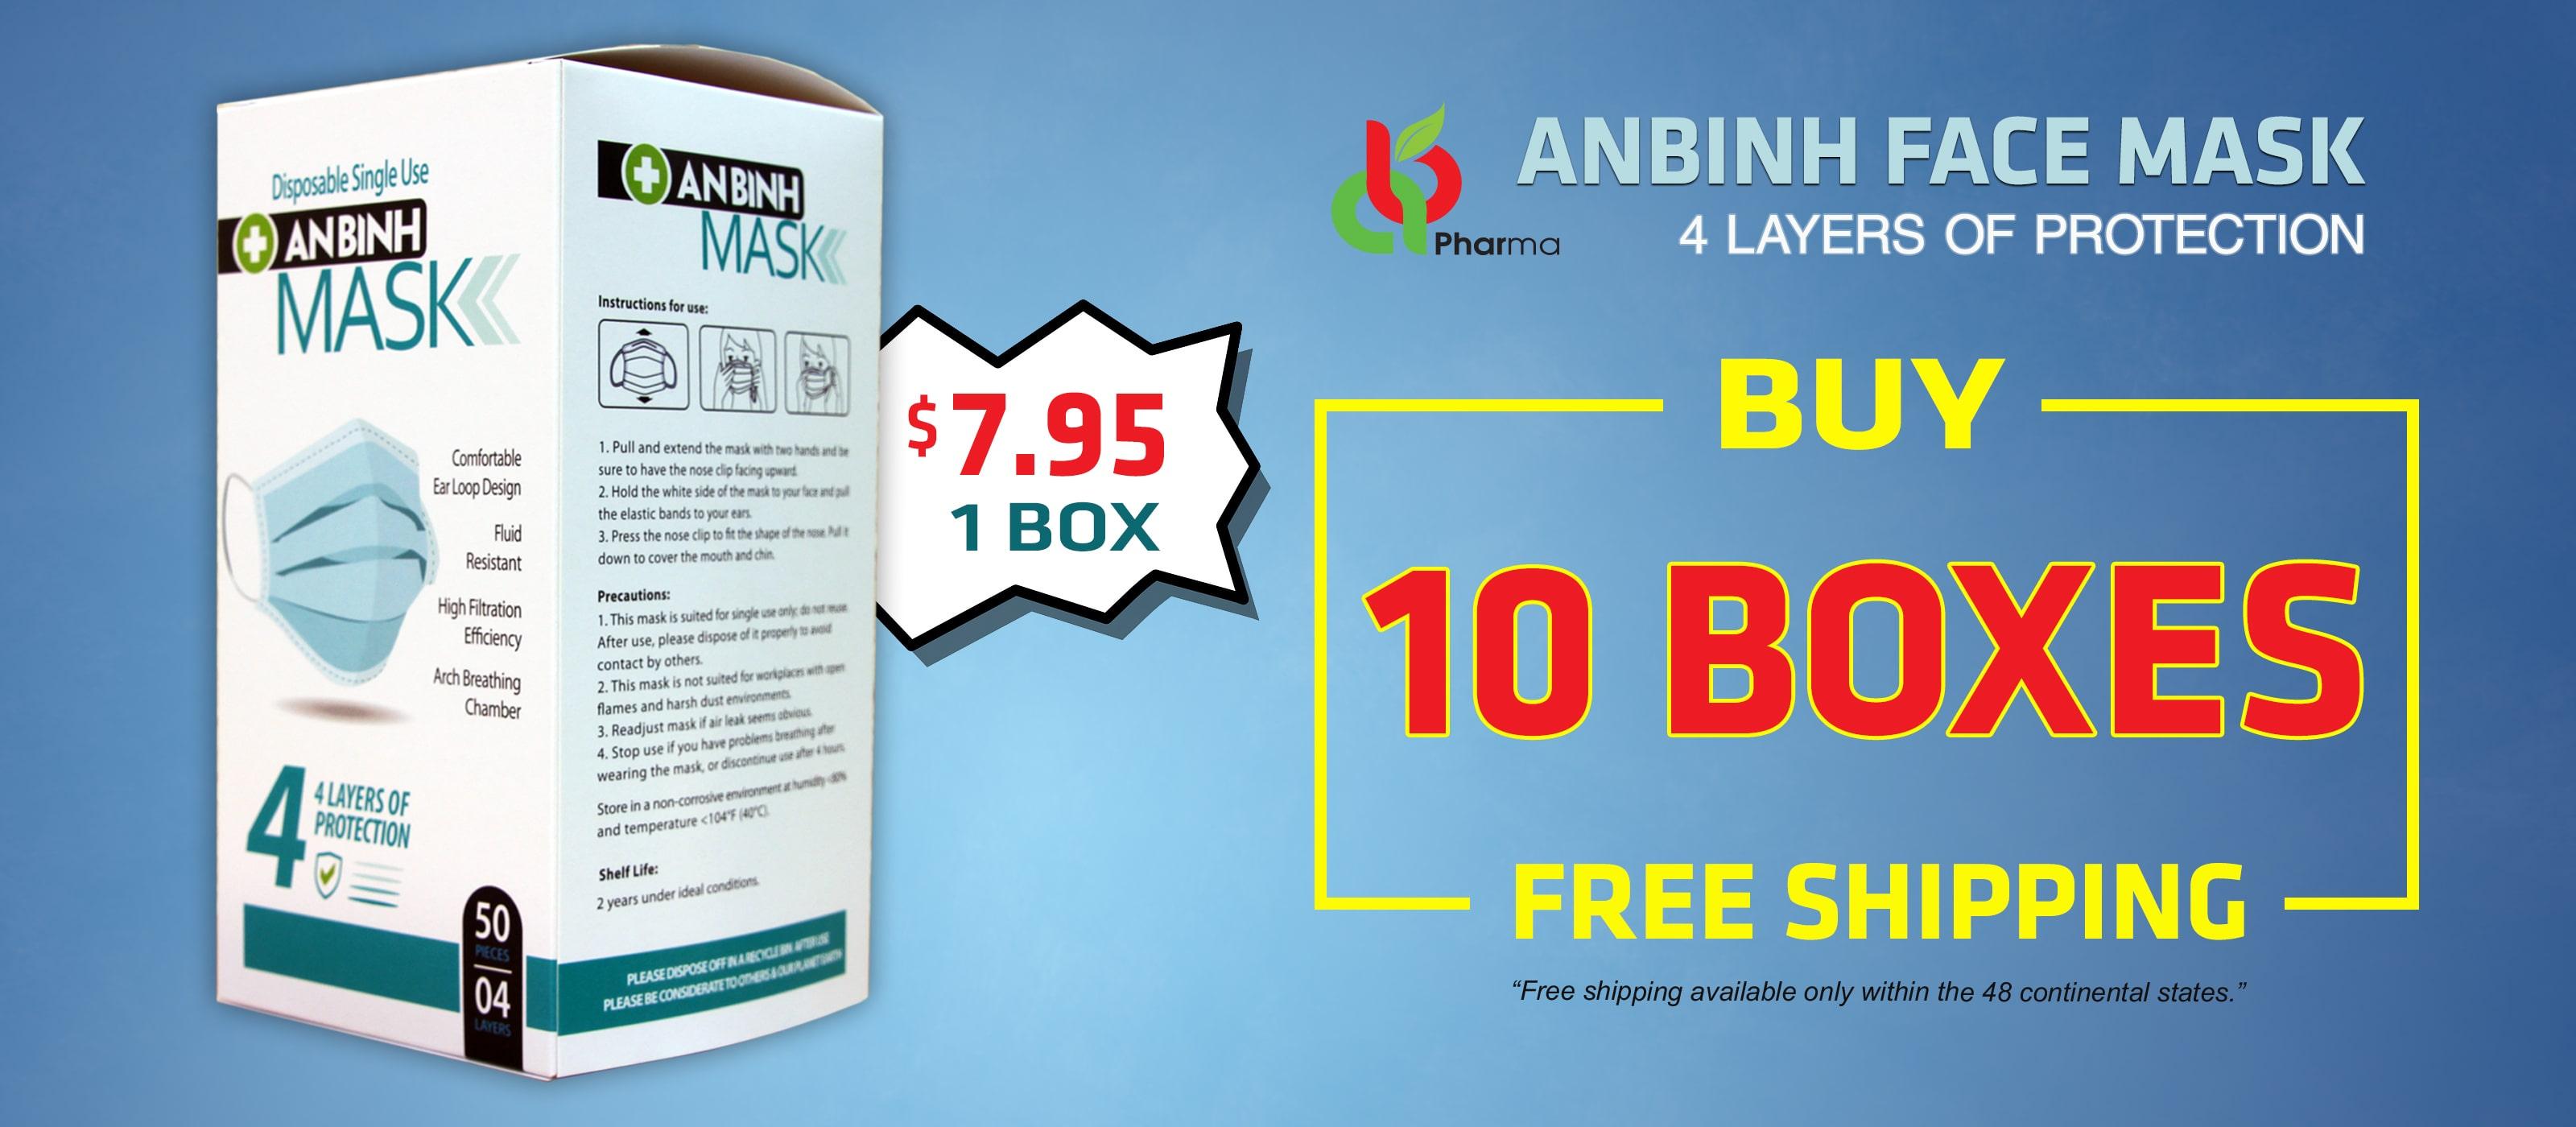 An Binh Pharma face mask BUY 10 BOXES FREE SHIPPING